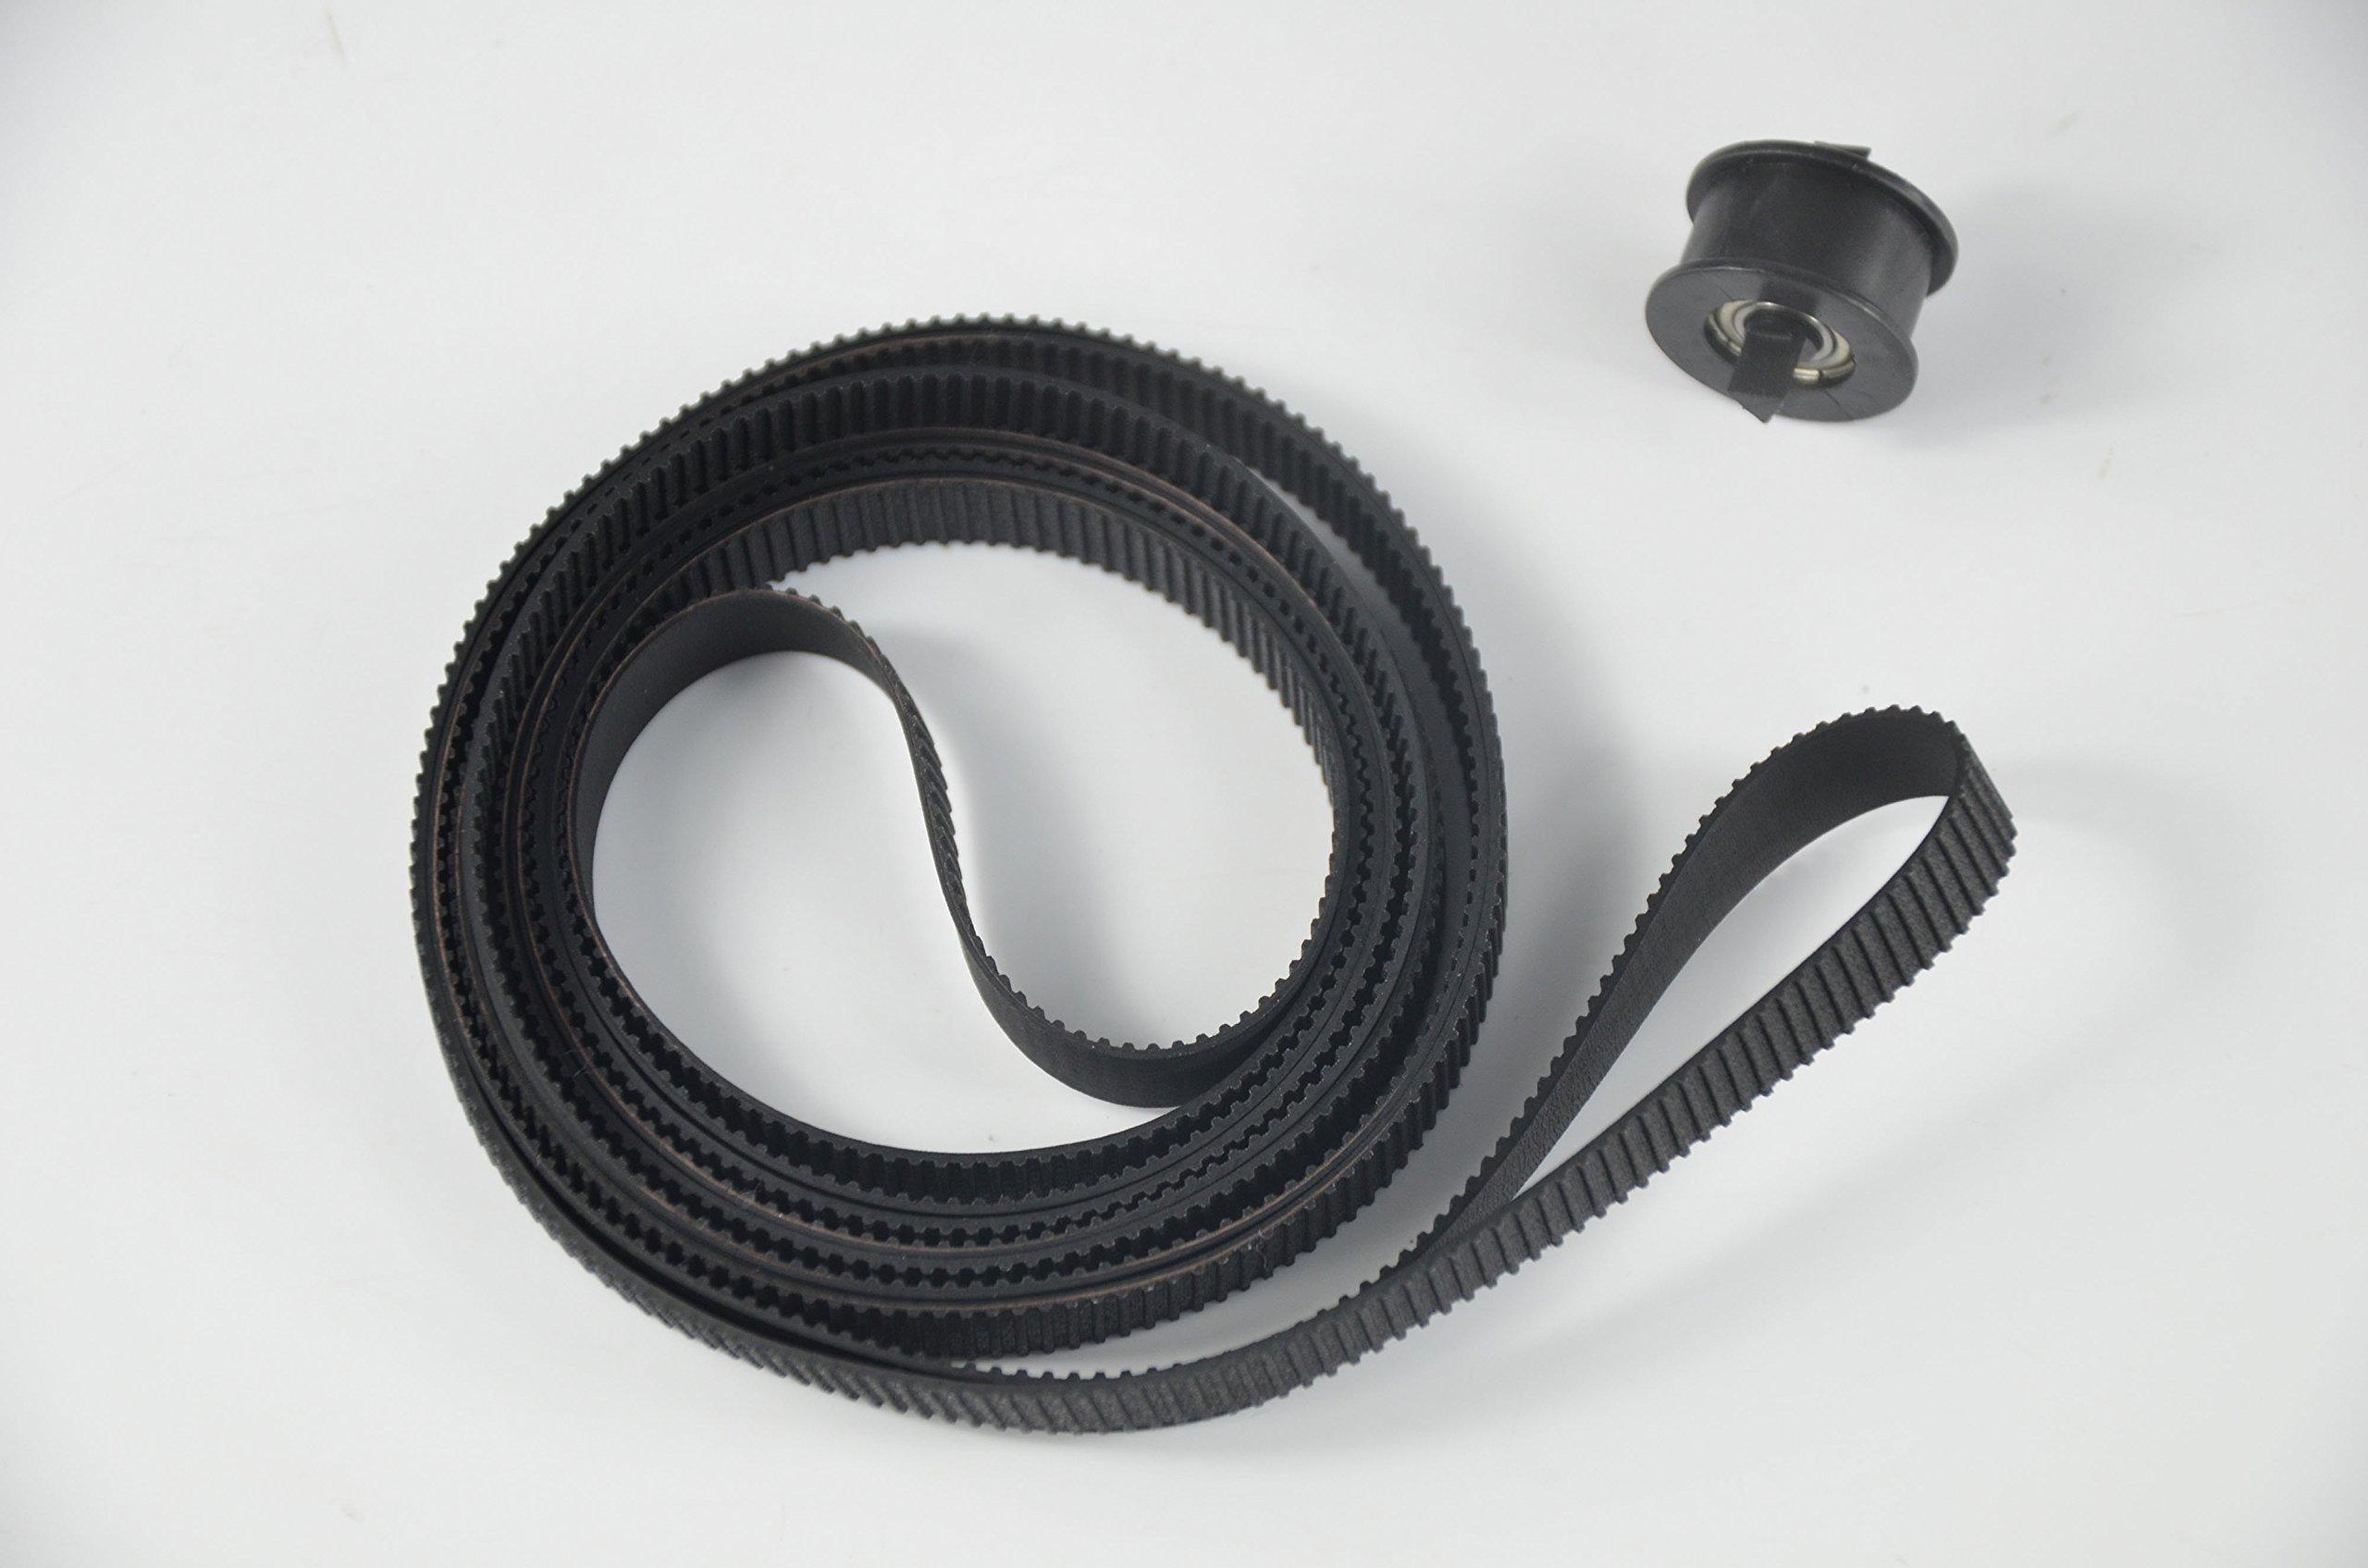 Eathtek Replacement Carriage belt For HP Designjet 500 500PS 510 510PS 800 800PS 24'' 24 inch CAR BELT